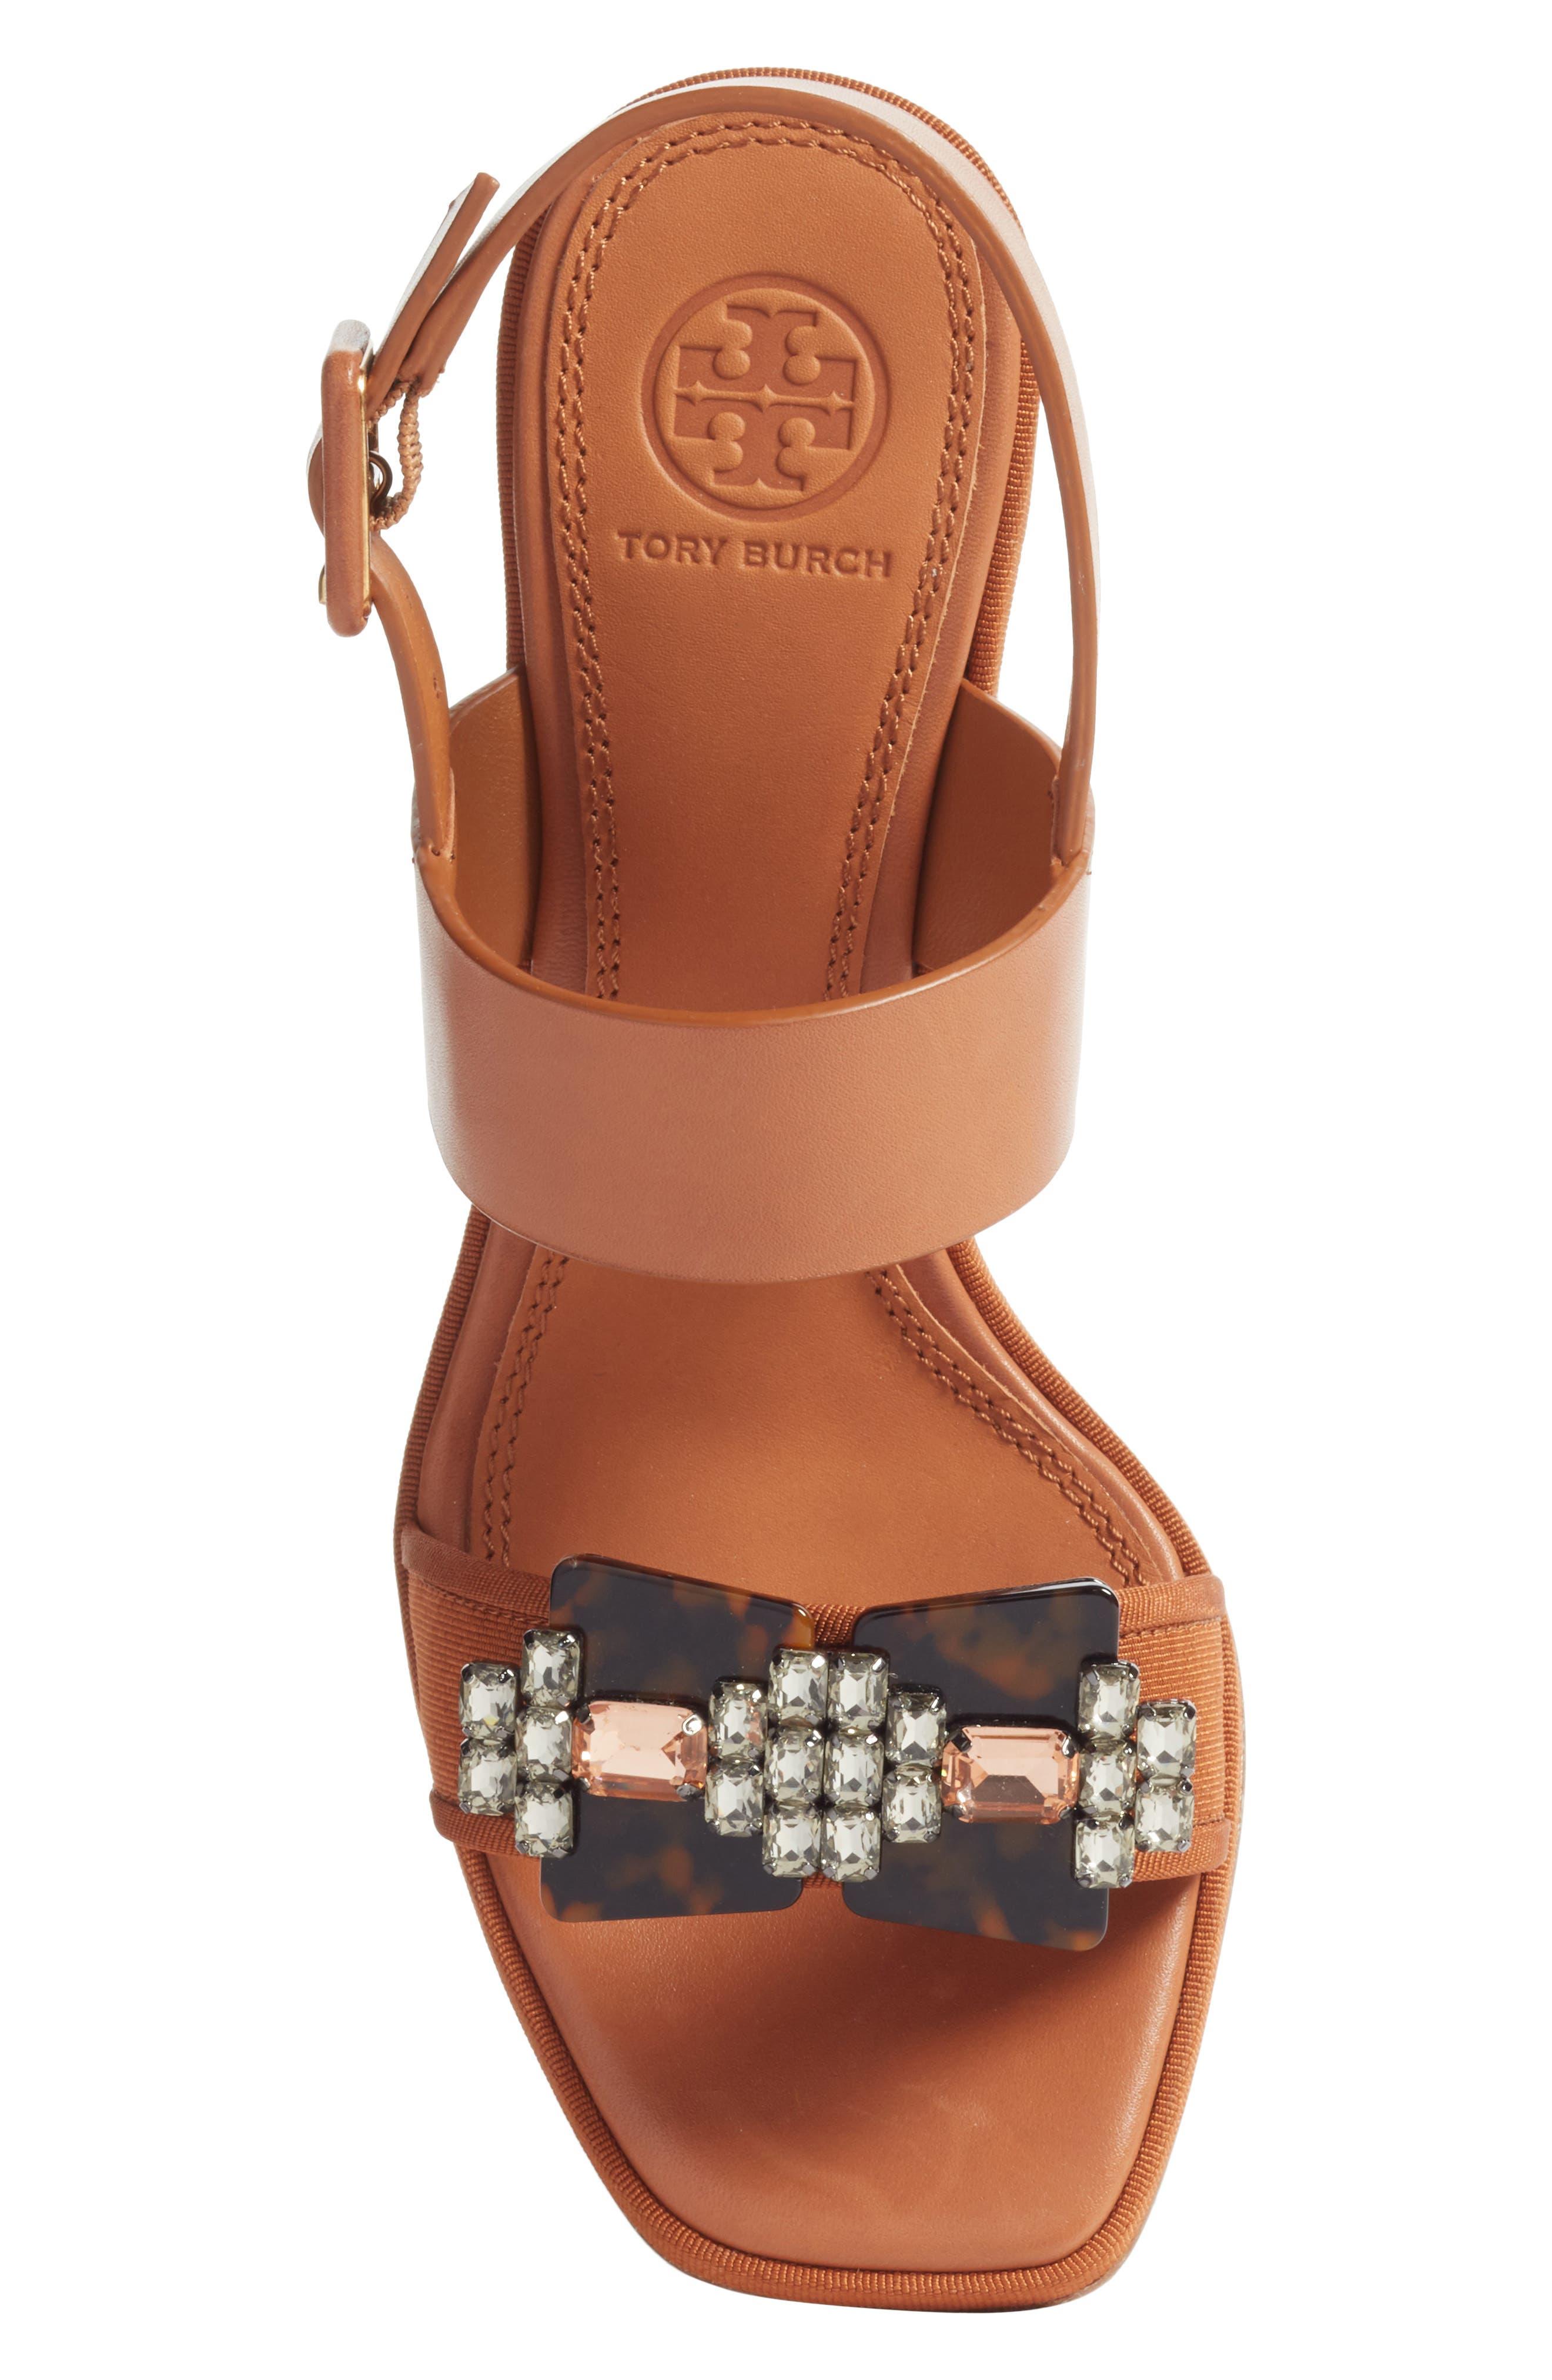 Delaney Embellished Double Strap Sandal,                             Alternate thumbnail 5, color,                             Tan/ Tan